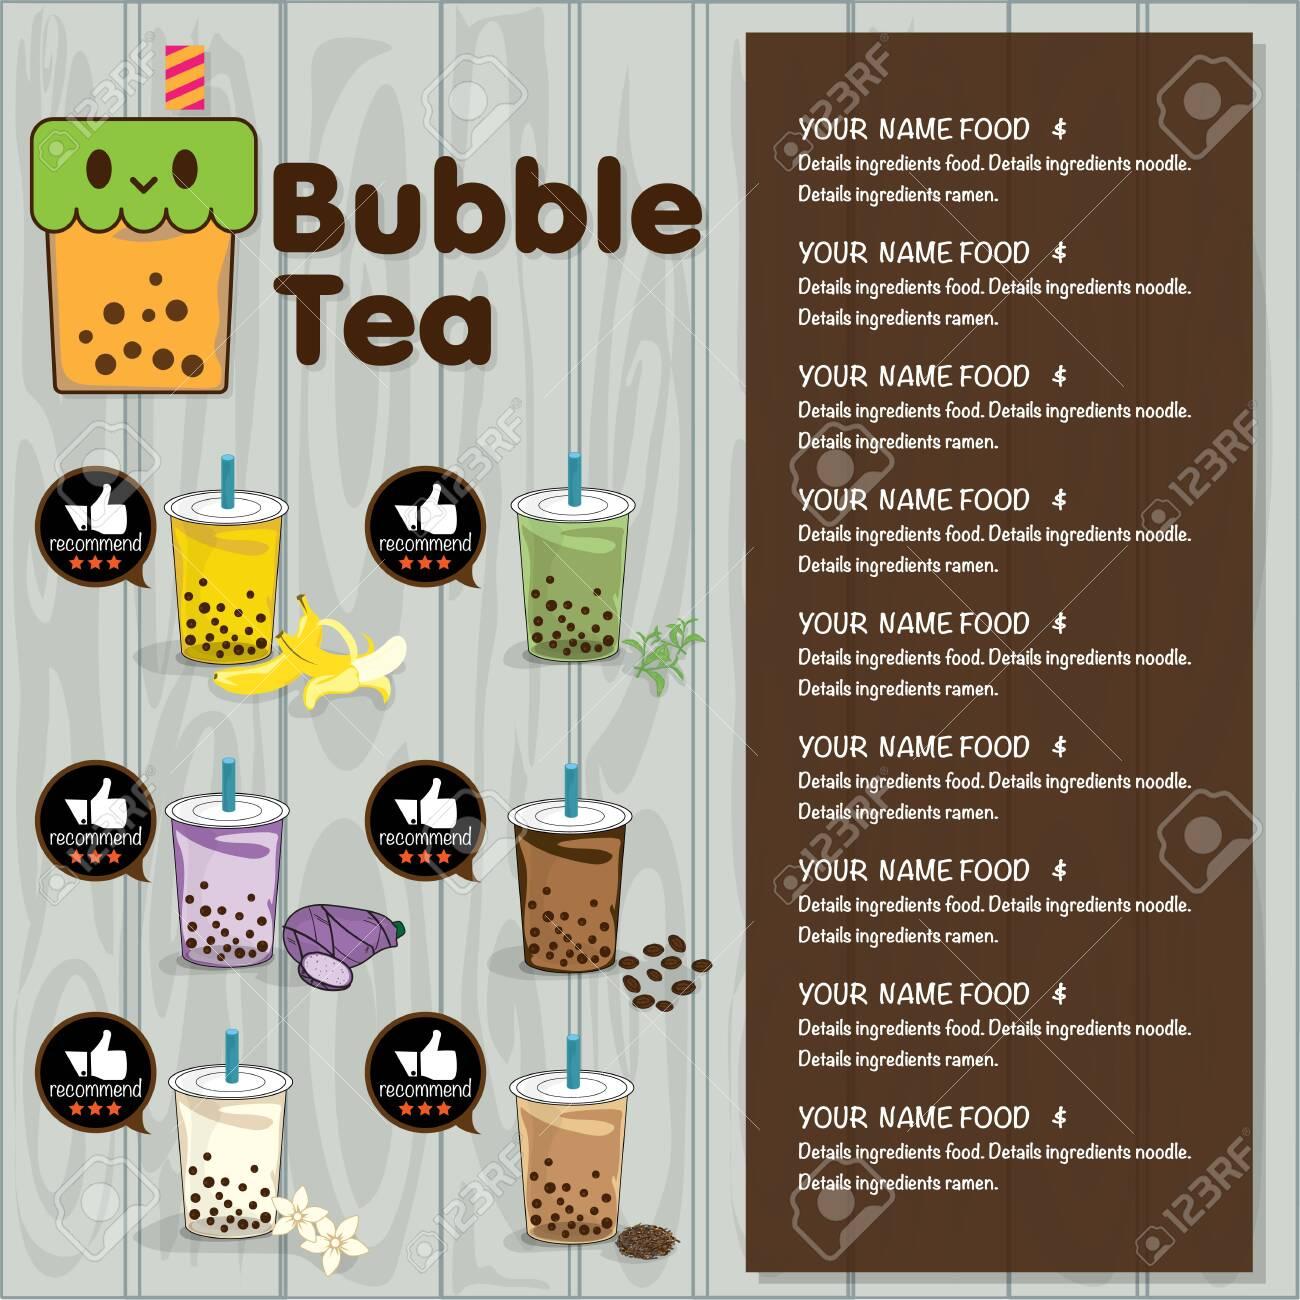 bubble tea menu graphic template - 125666373